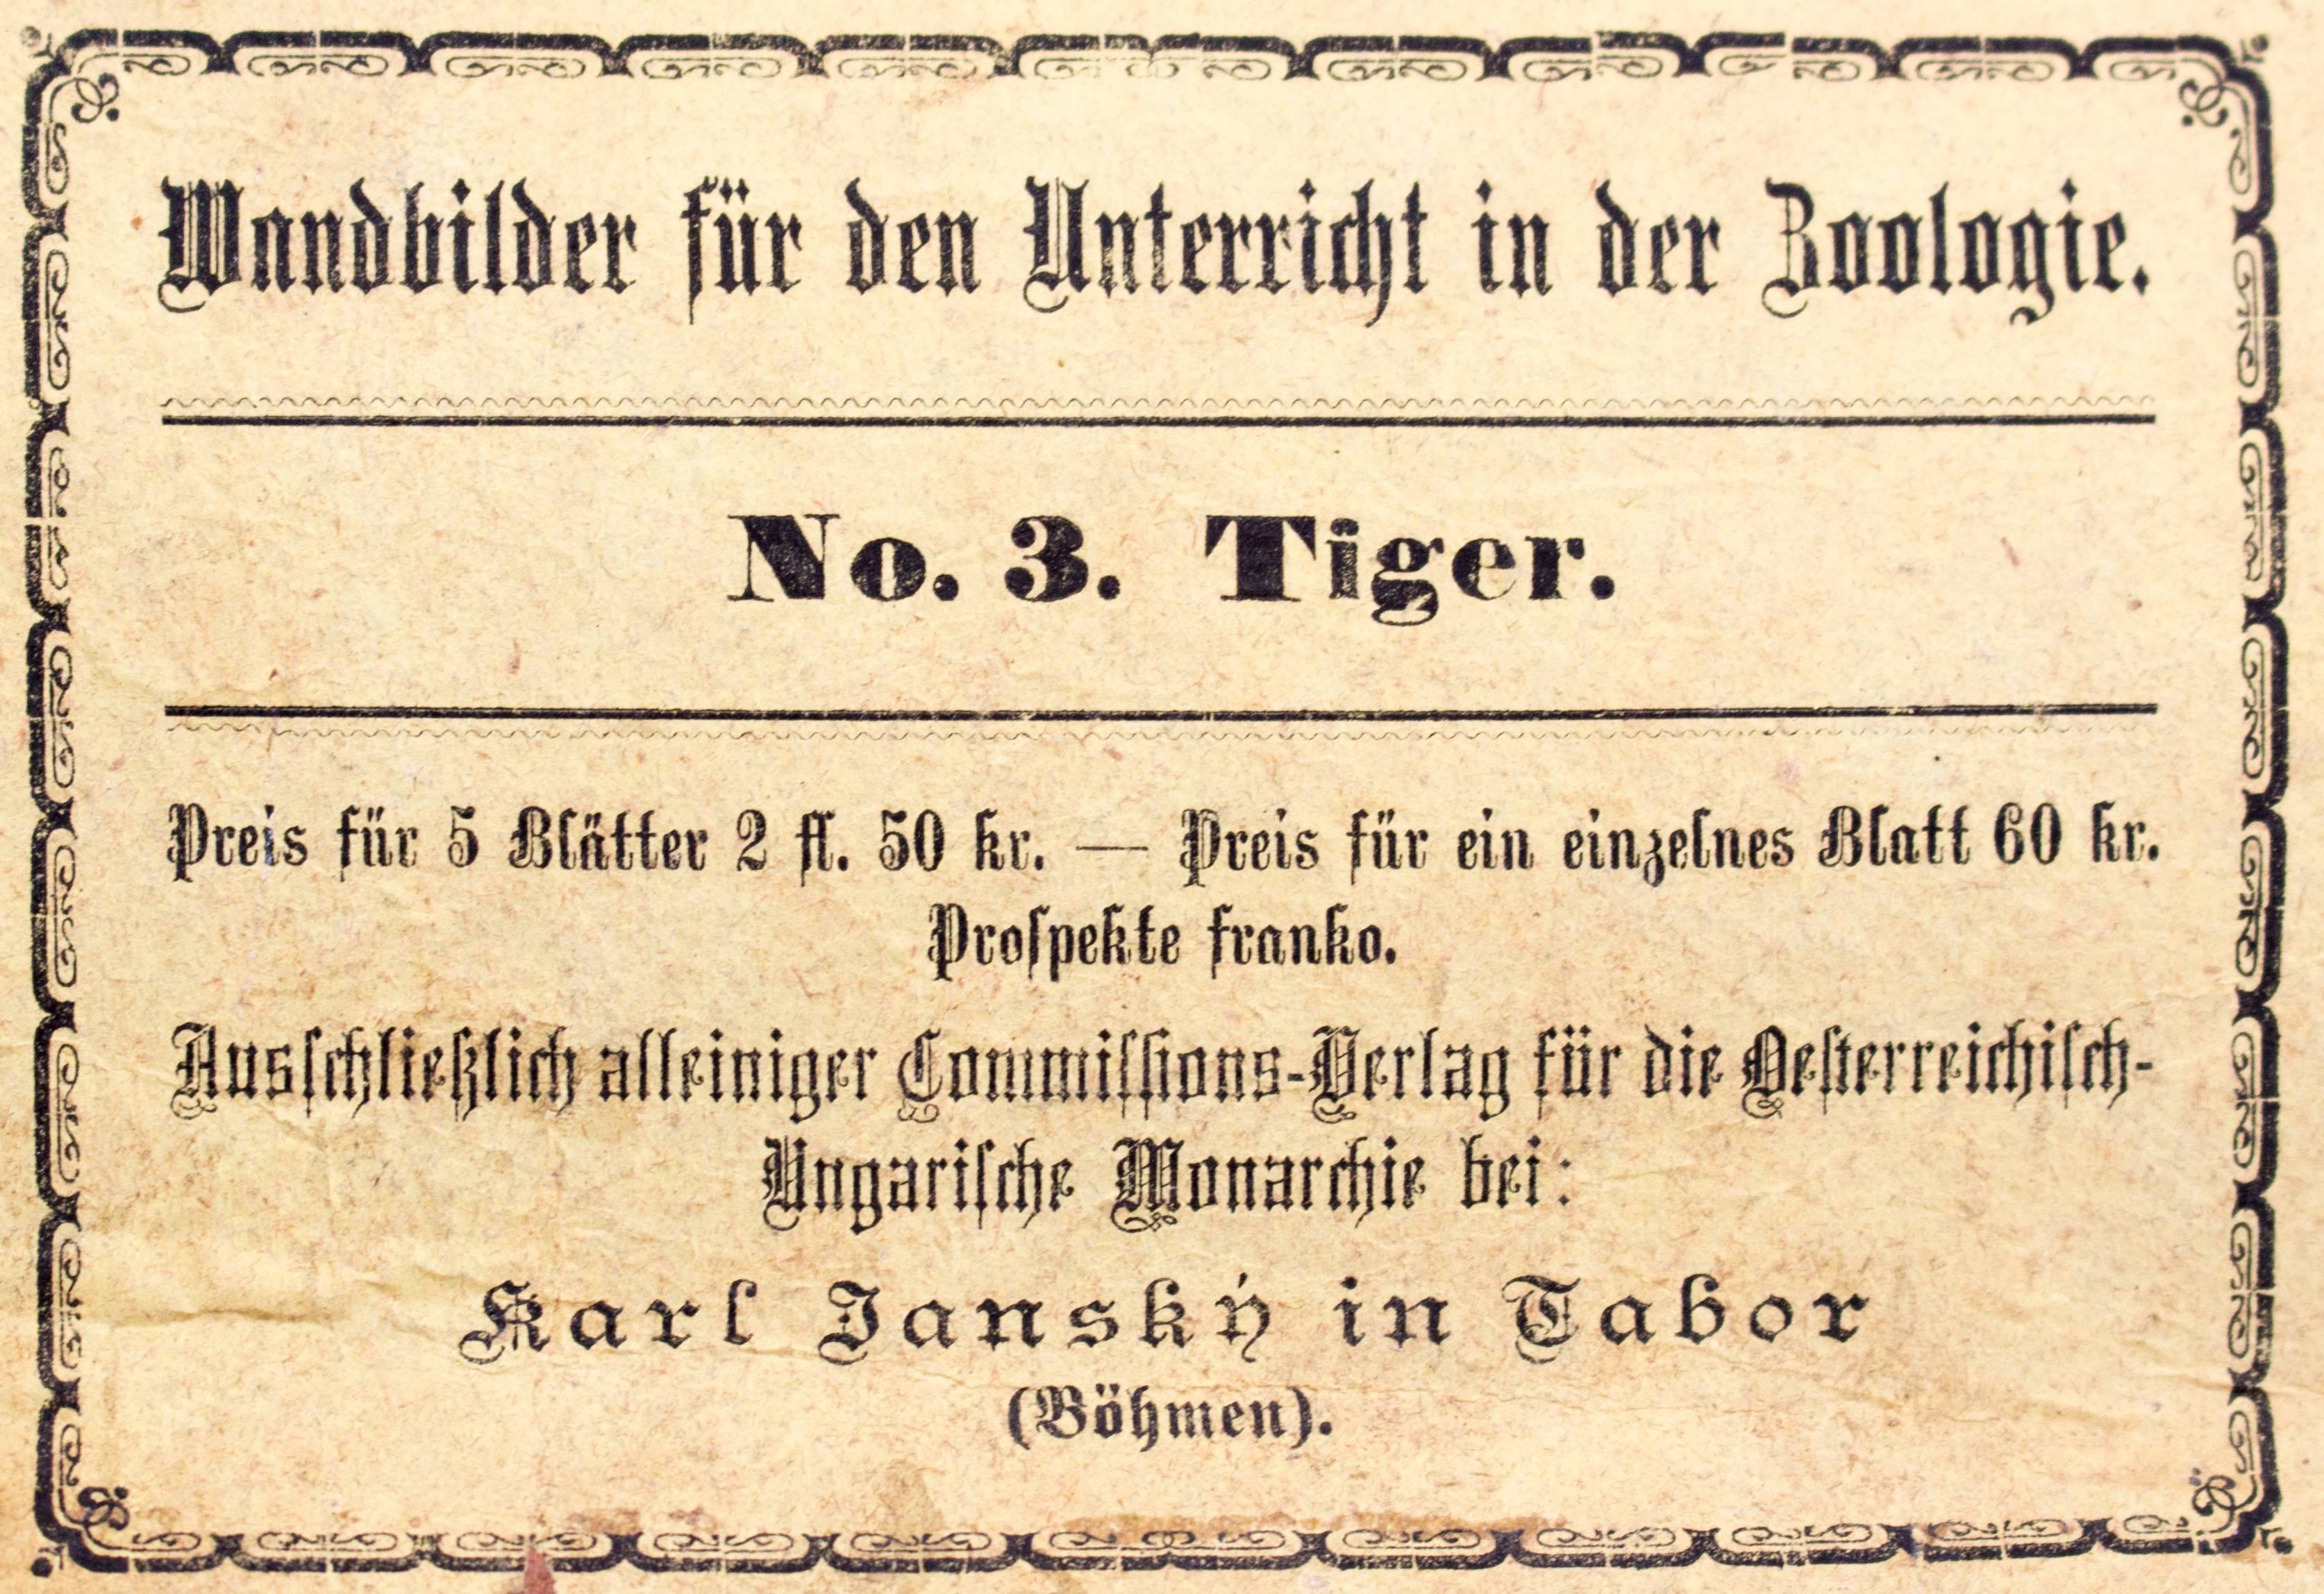 Wall Chart Tiger, Lithograph by Karl Jansky, Böhmen, 1887 For Sale ...